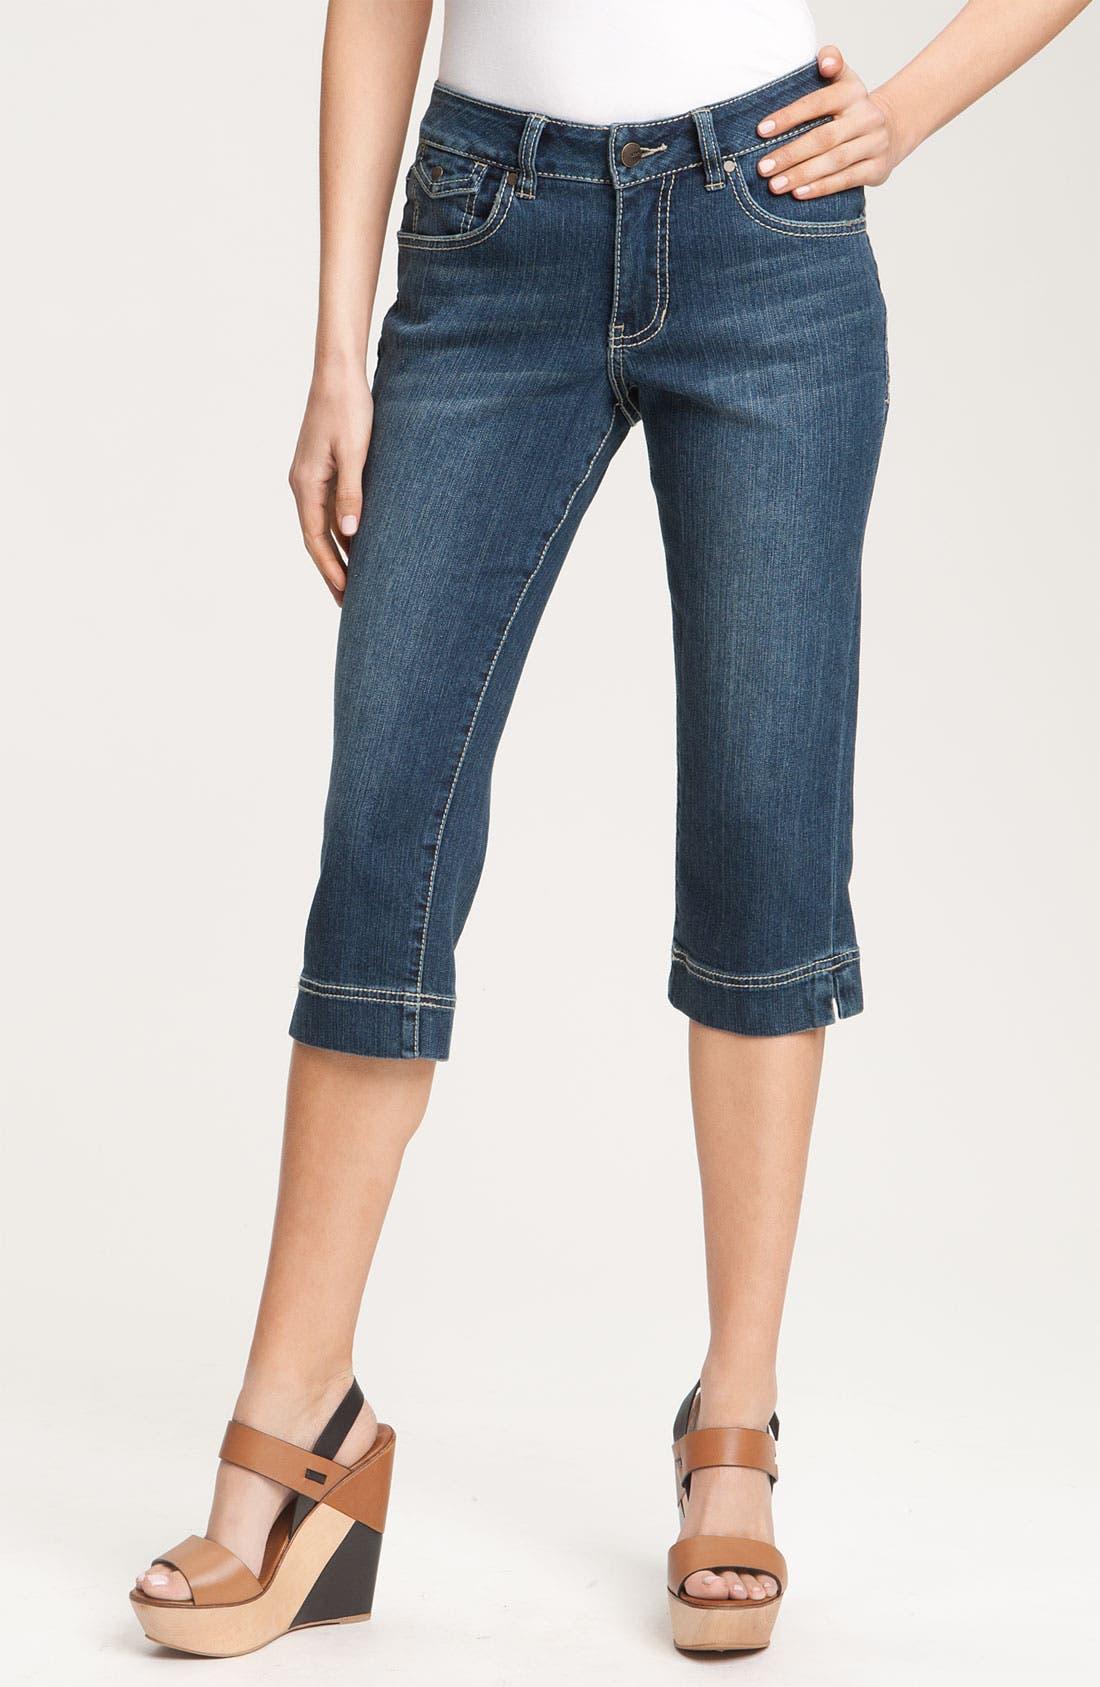 Alternate Image 2  - Jag Jeans 'Selma' Crop Jeans (Petite)